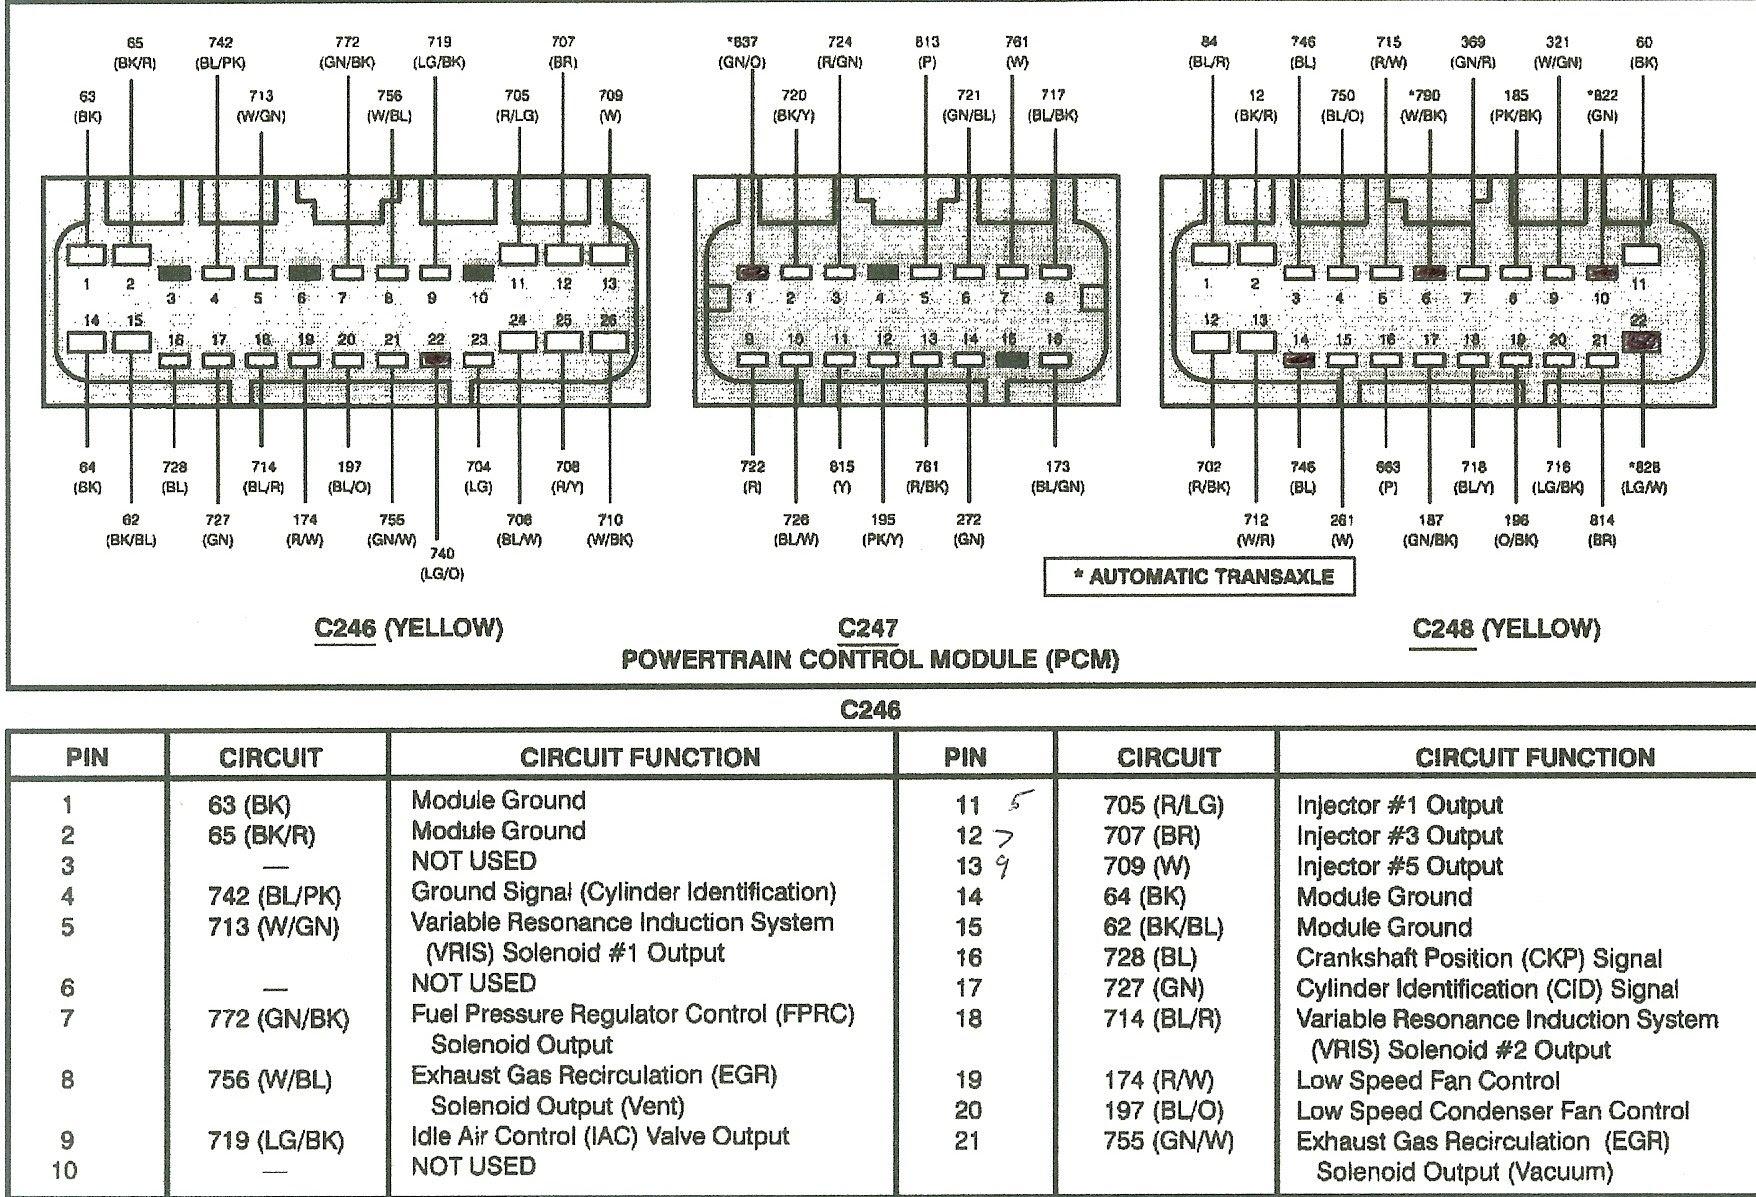 Diagram Saturn Pcm Wiring Diagram Full Version Hd Quality Wiring Diagram Blogxgoo Mefpie Fr